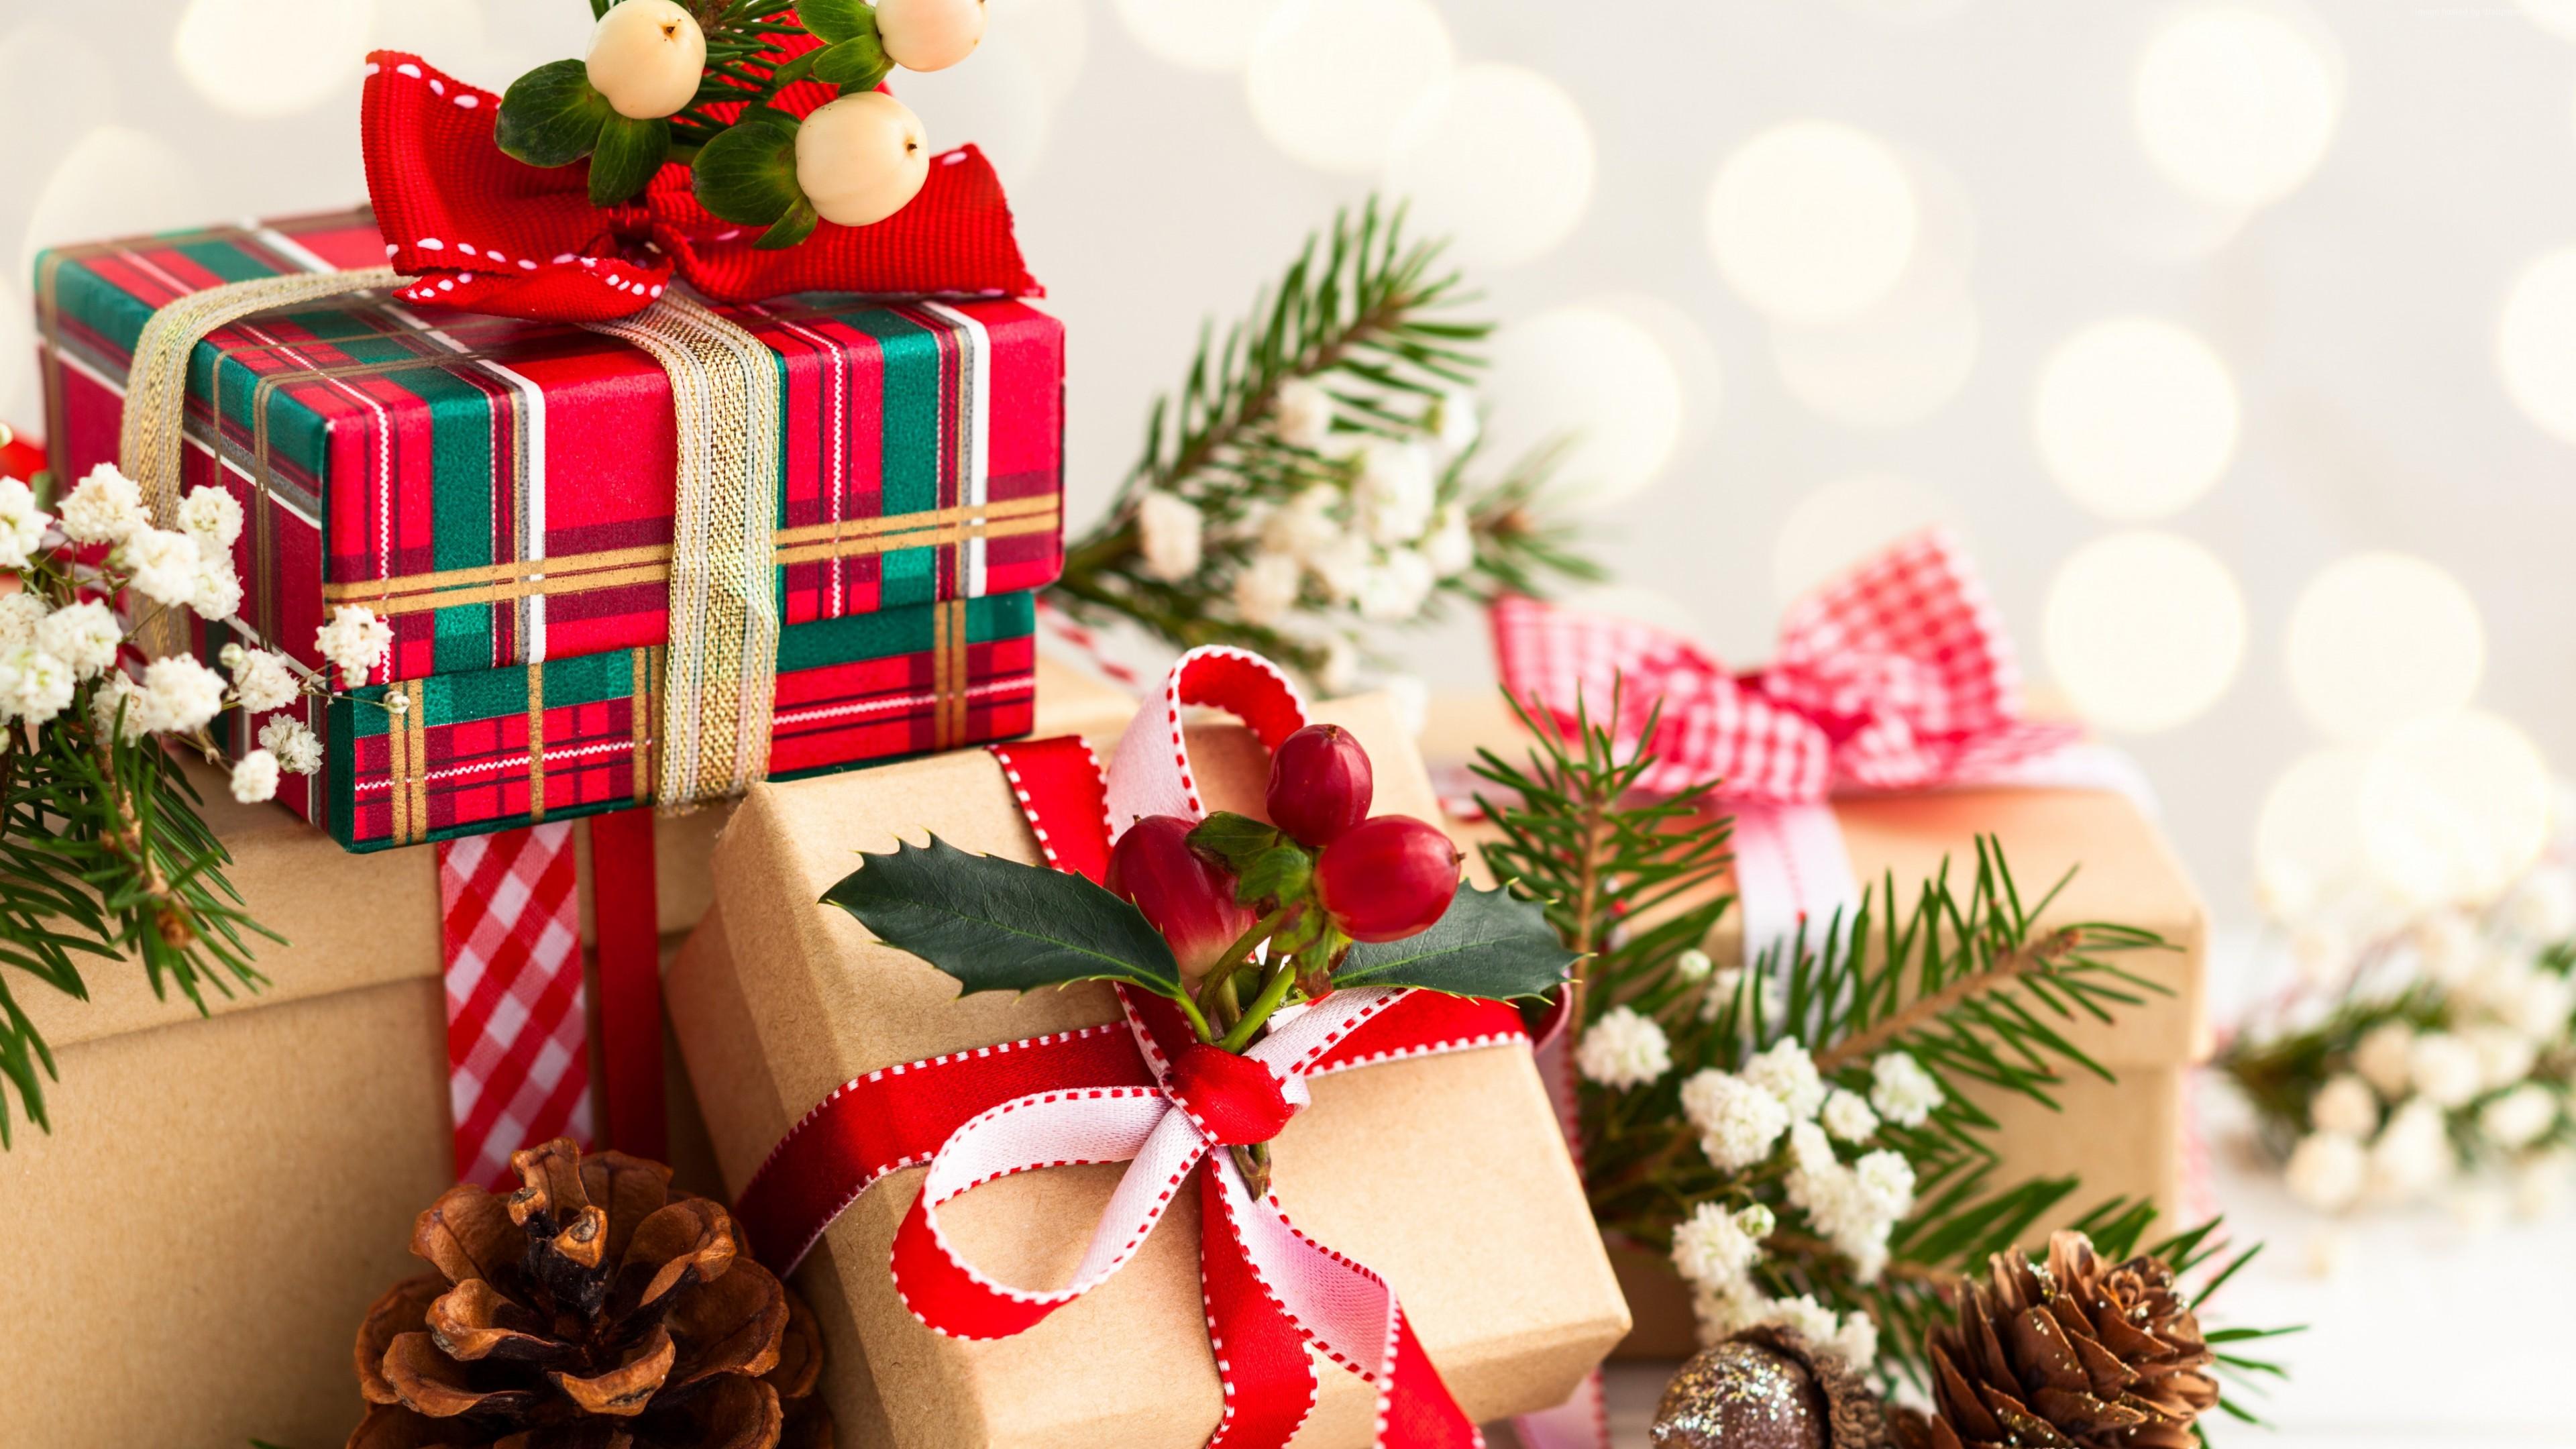 Wallpaper Christmas, New Year, Gifts, 4K, Holidays